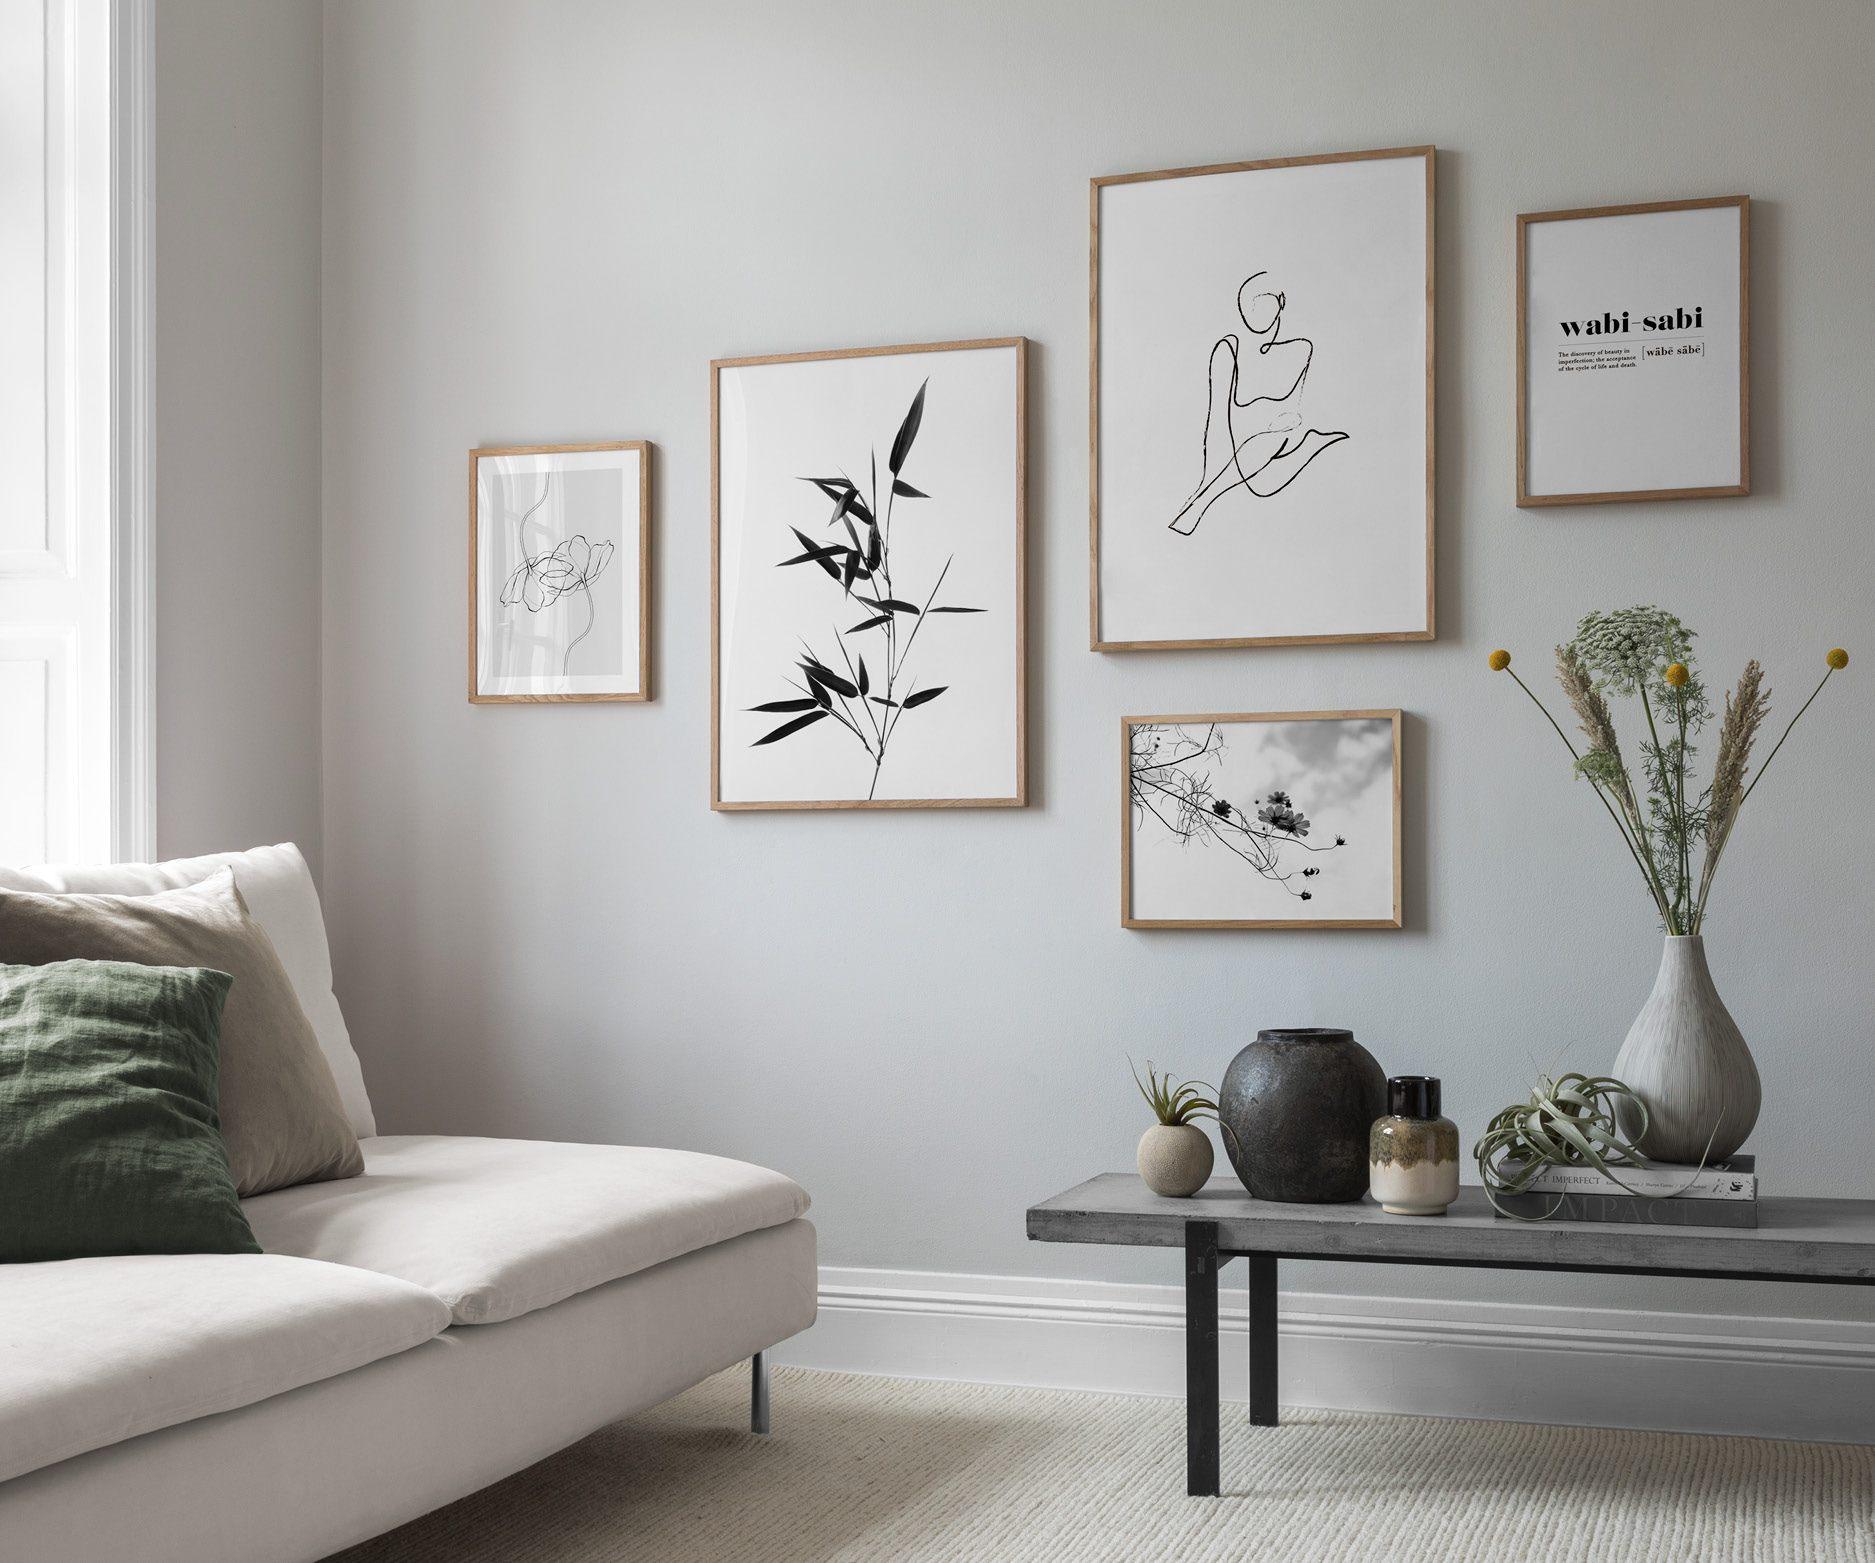 Lugn harmonisk inredning, minimalistisk tavelvägg